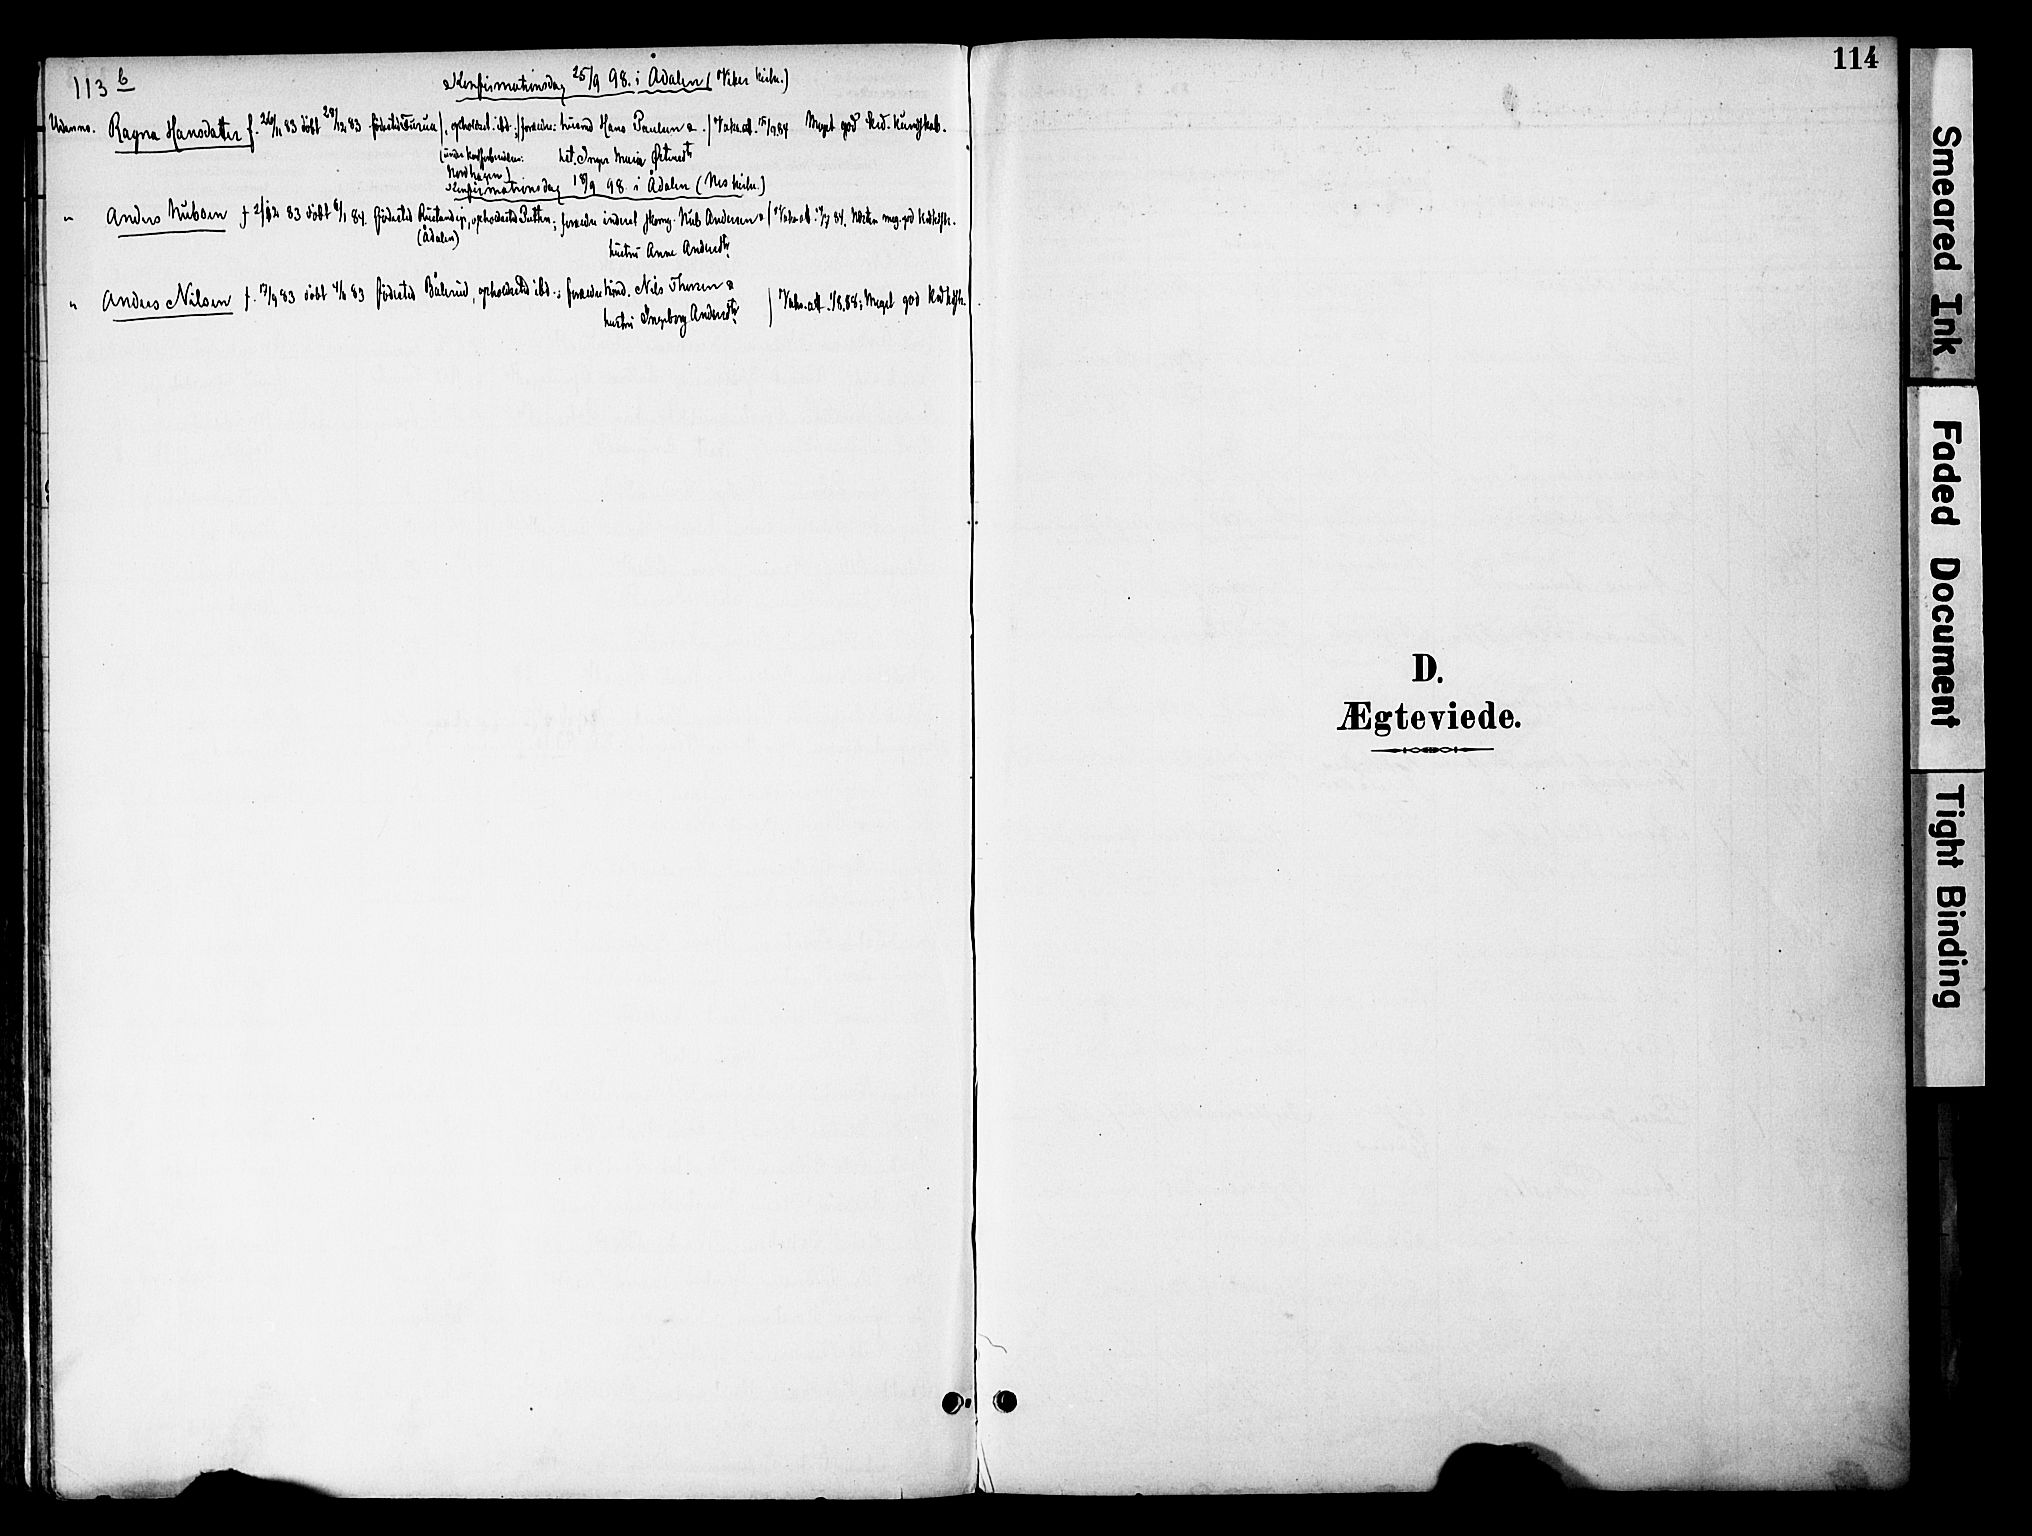 SAH, Gran prestekontor, Ministerialbok nr. 20, 1889-1899, s. 114